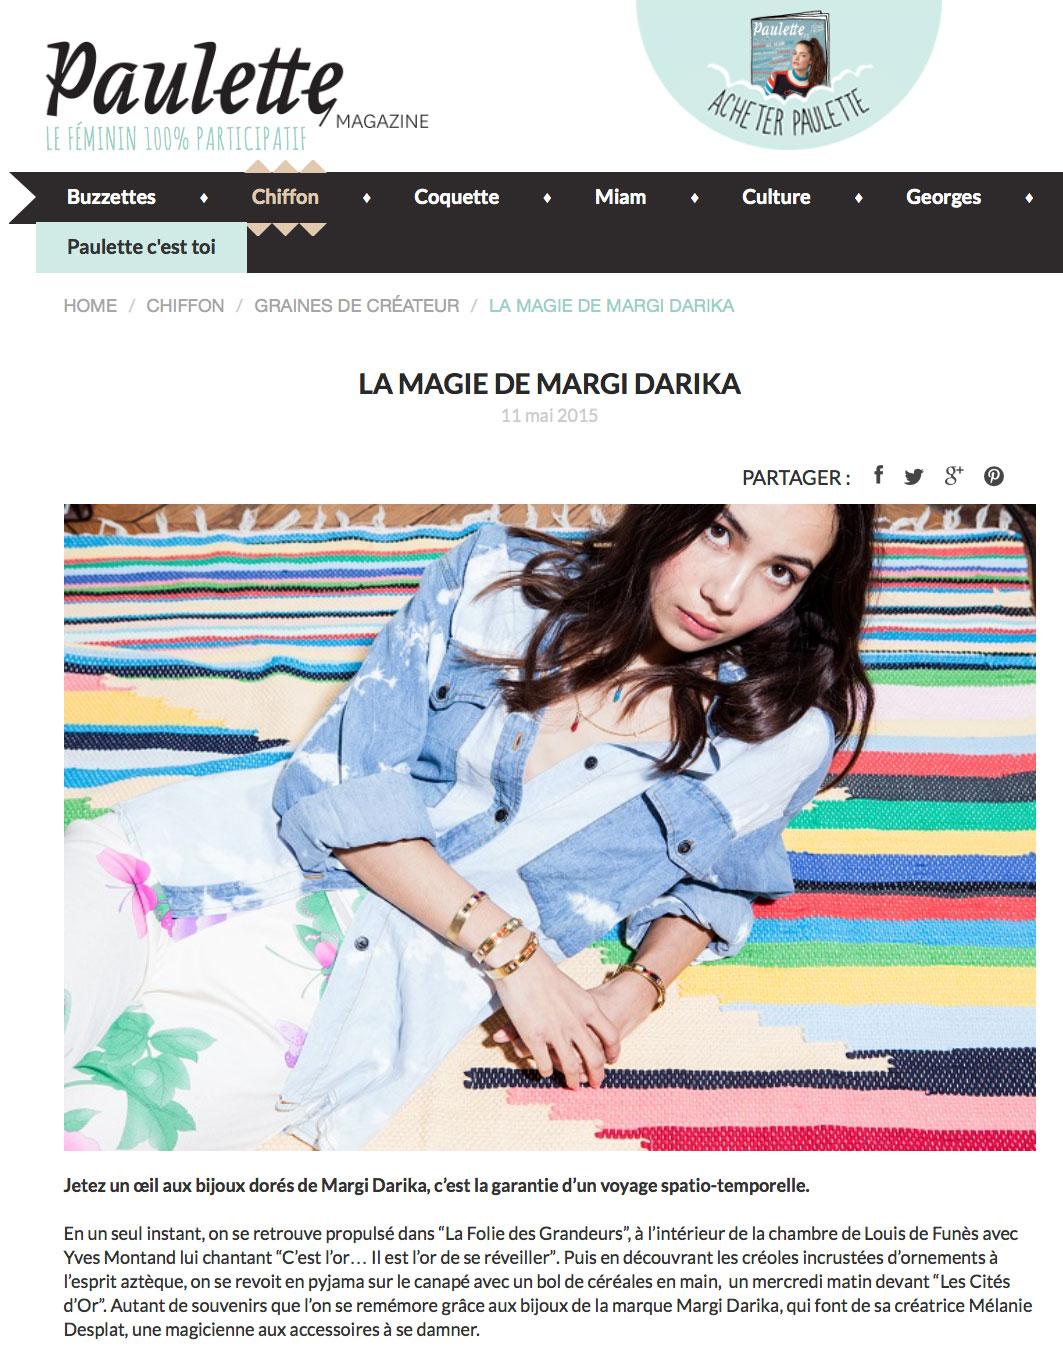 Paulette magazine parution Margi Darika 05/15.